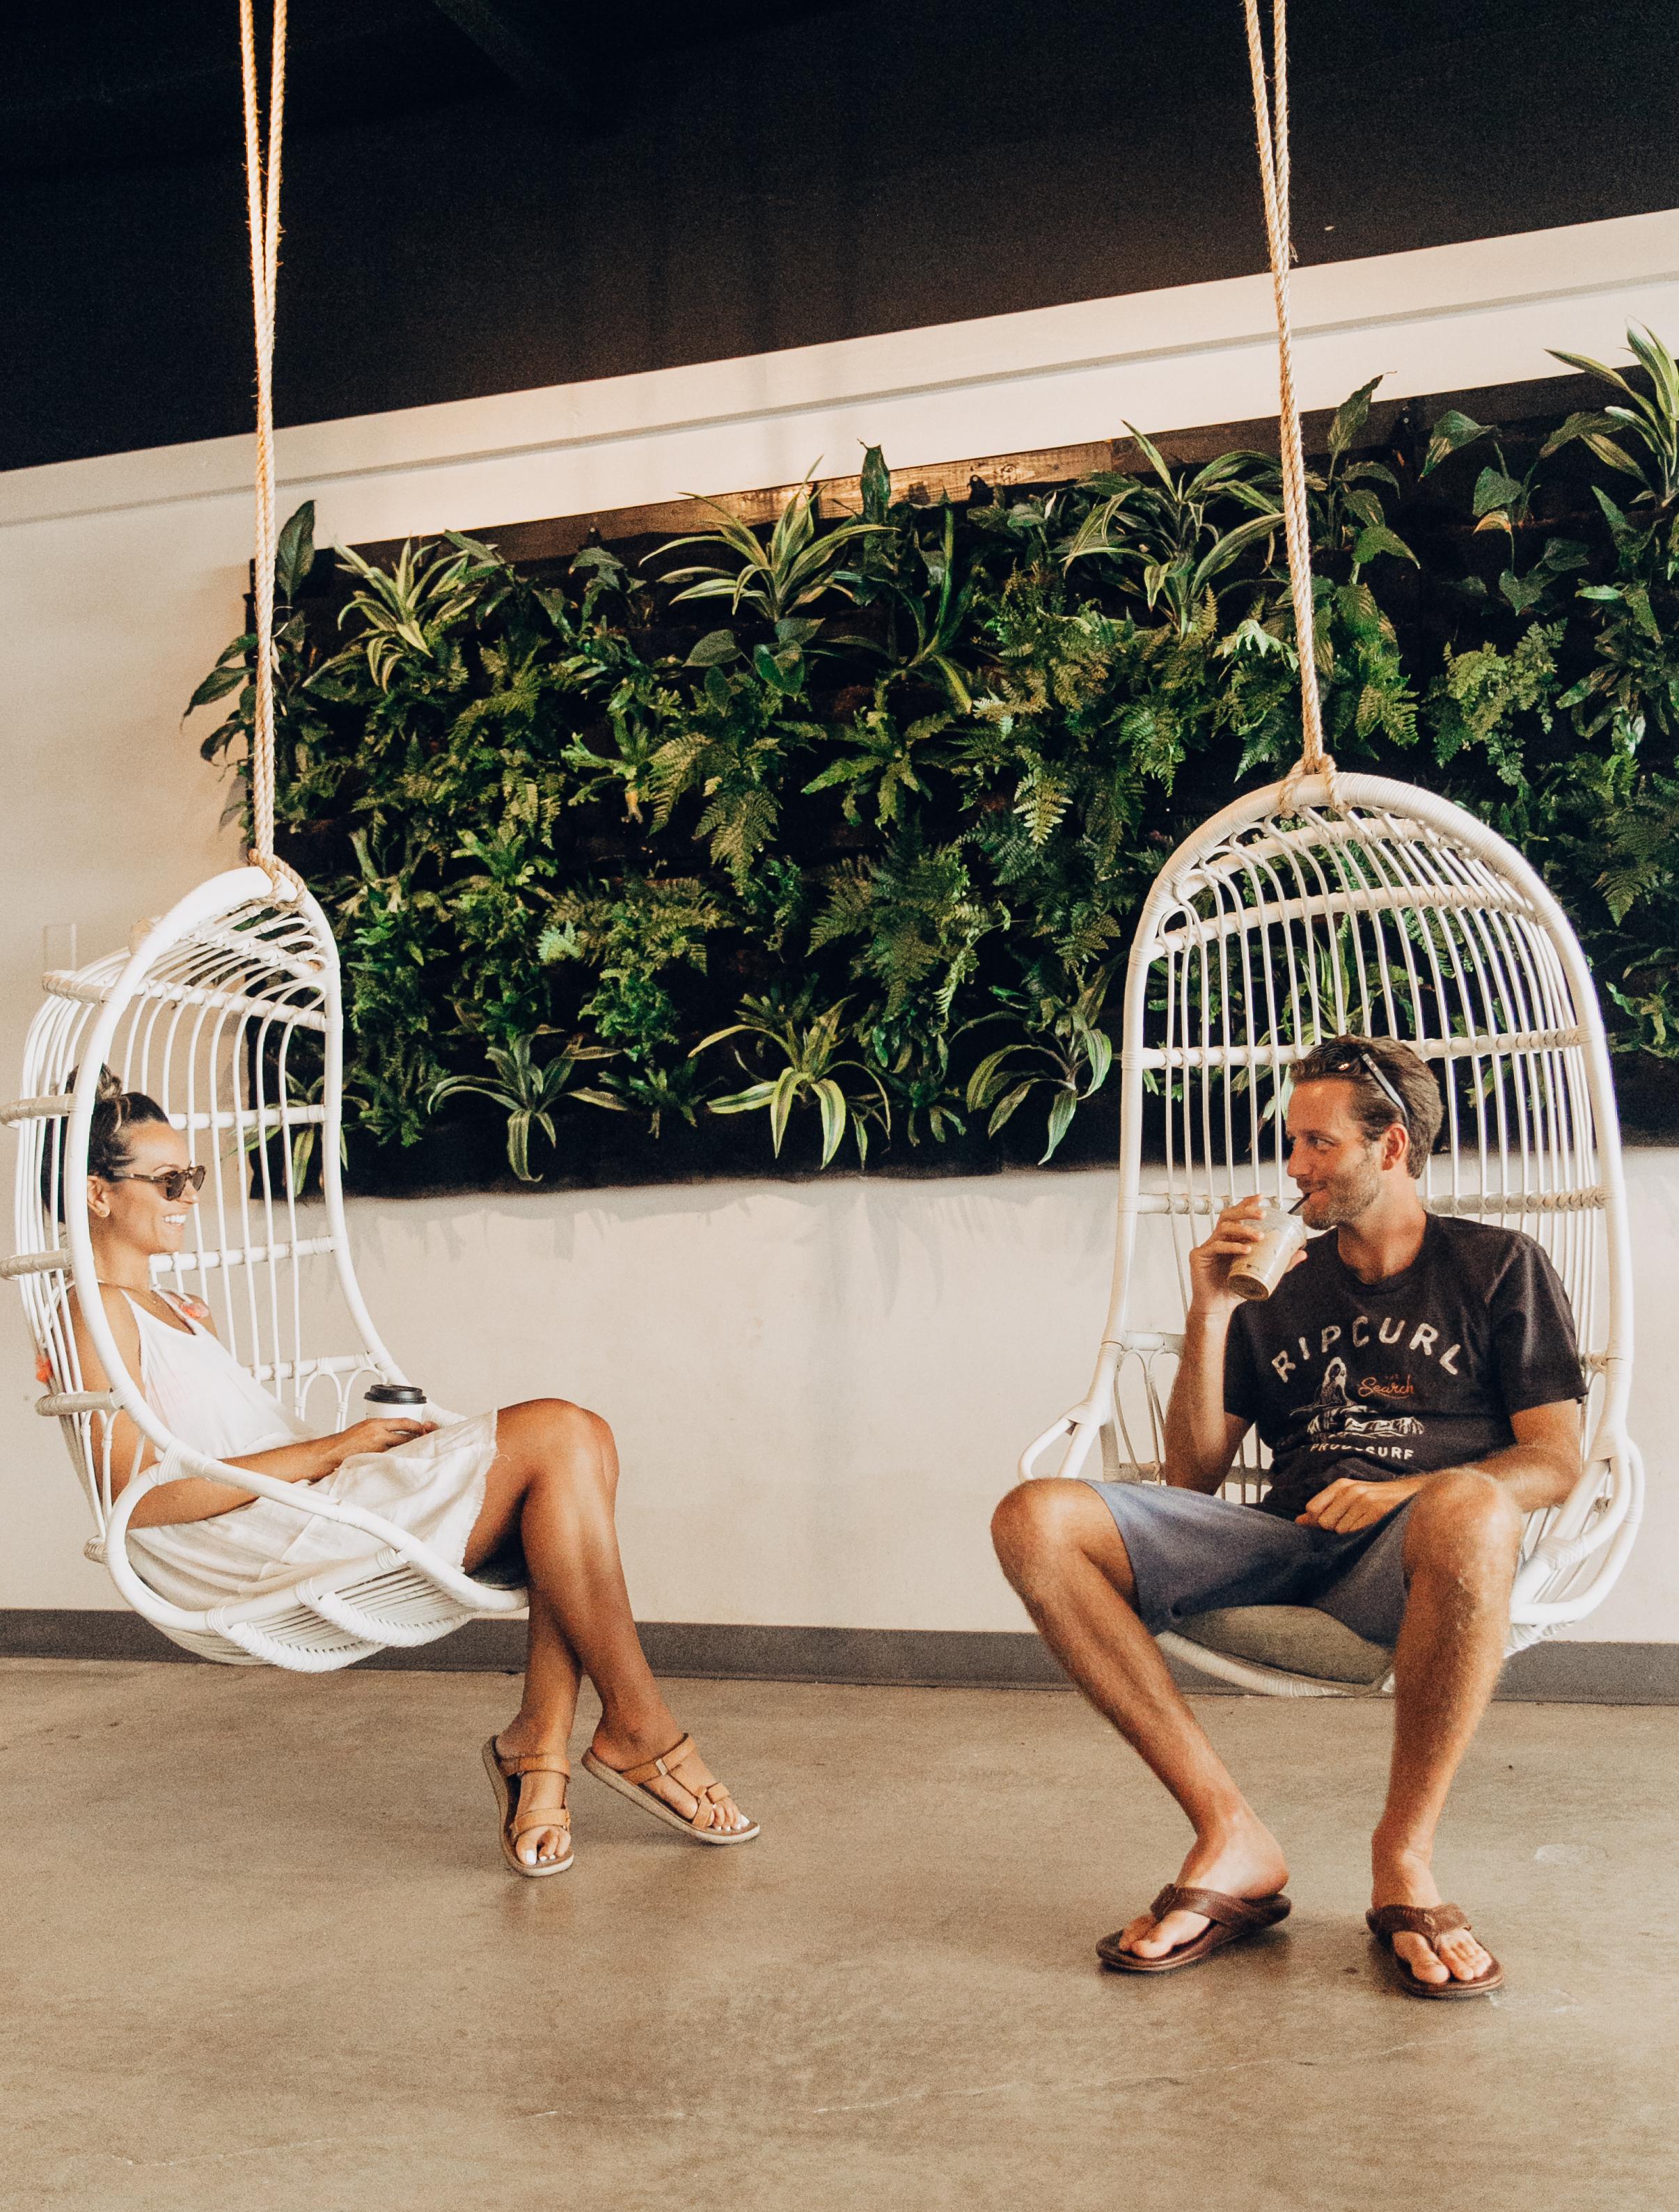 Akamai Coffee | Cute Coffee Shop in Maui | Modern Coffee Shop in Maui | Best Coffee Shops in Maui | Traveling Couple | Travel Inspiration | Hawaiian Island Hopping | Weekend In Maui | Guide to Spending The Weekend in Maui | Travel Blogger's Maui Recommendations via @elanaloo + elanaloo.com